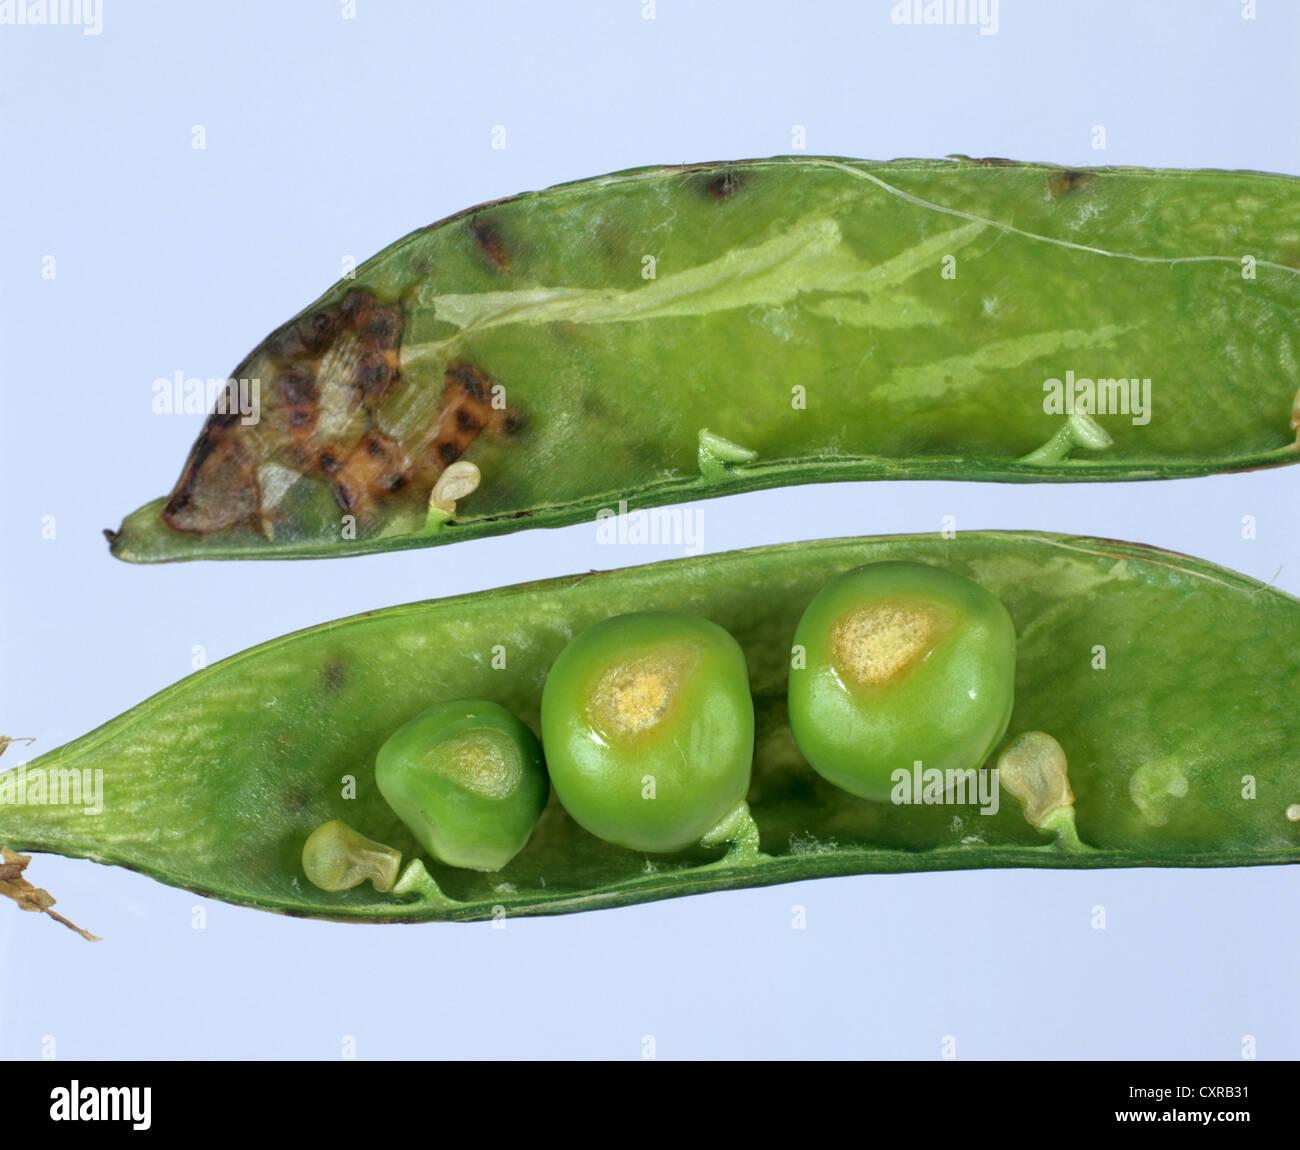 Marsh spot, manganese deficiency symptoms on peas in open pod - Stock Image